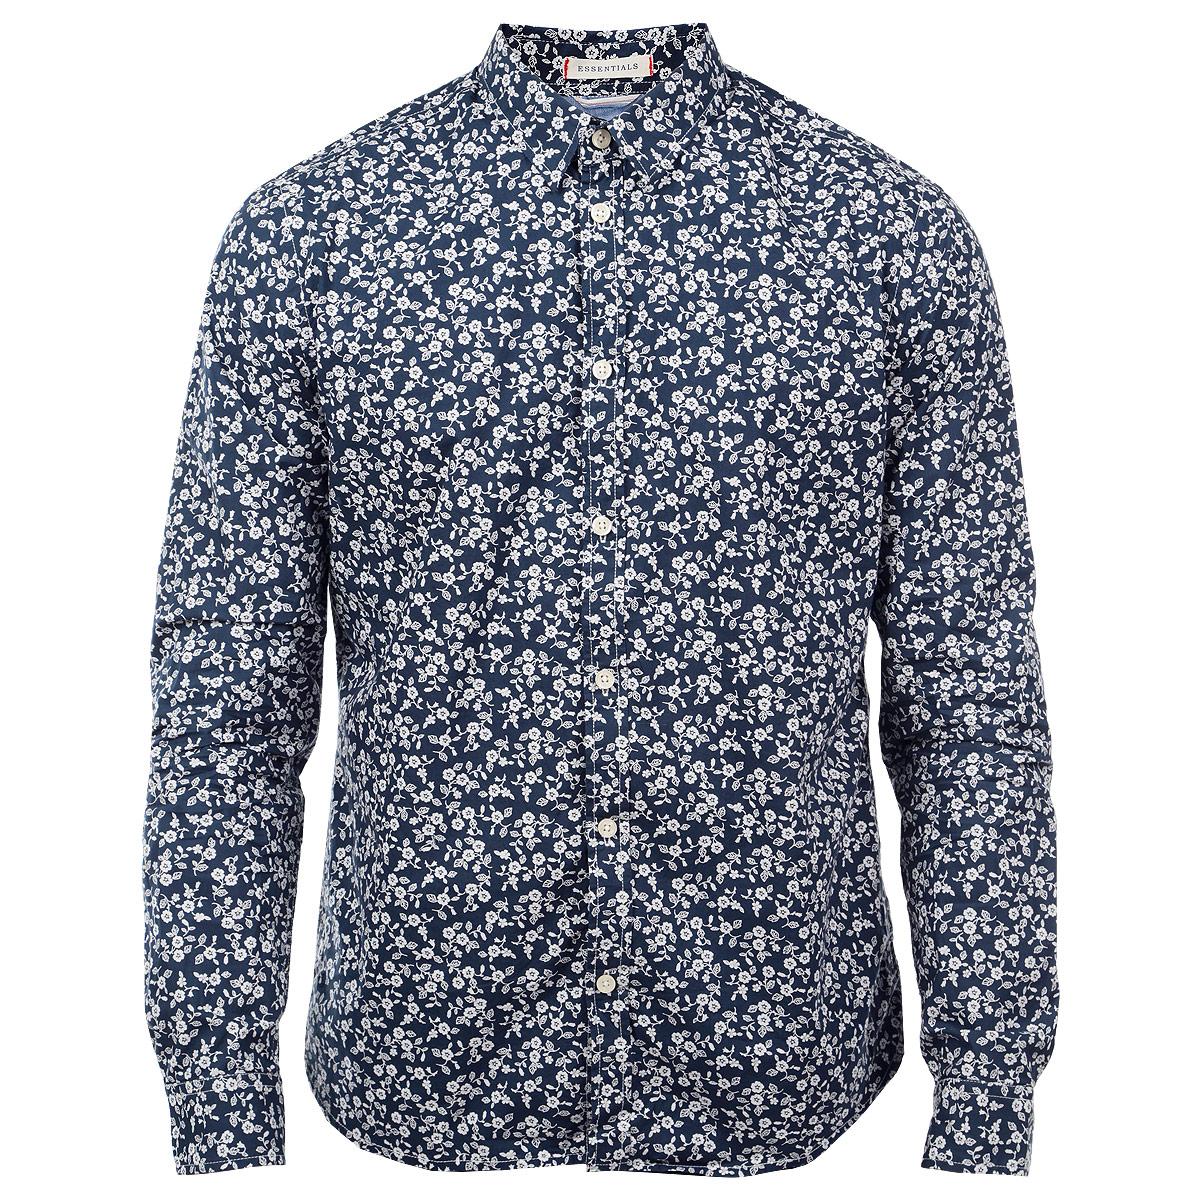 Pepe Jeans Рубашка мужская. PM301570